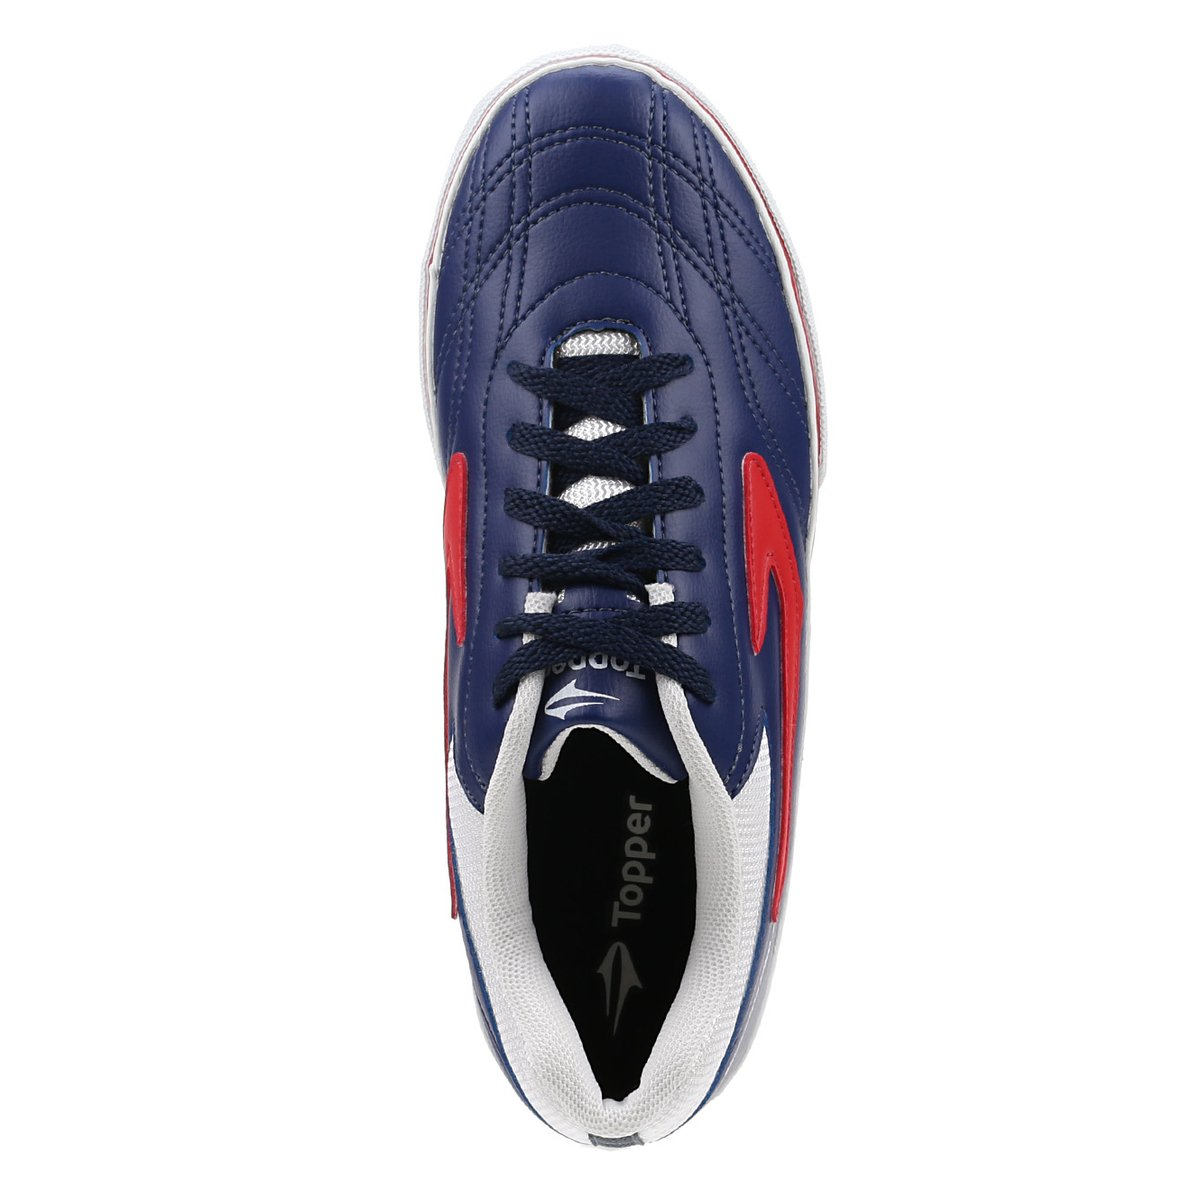 fa68569a04 Tênis Futsal Masculino Topper Dominator Iii - Compre Agora